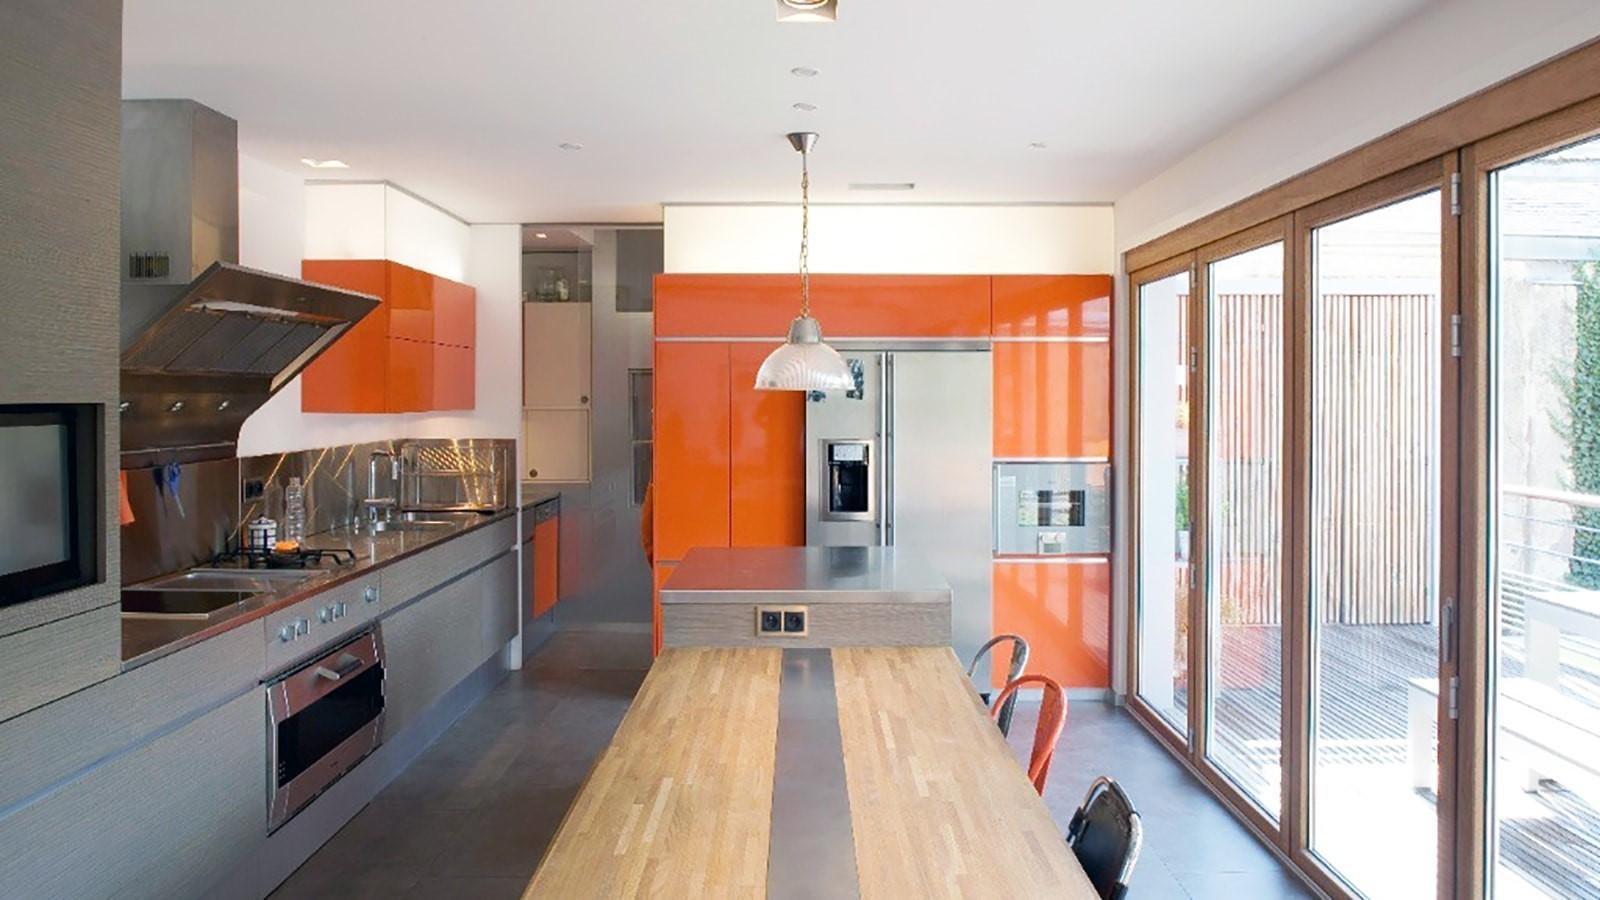 Cuisine Chambre Salon Nantes Efi Design (5)